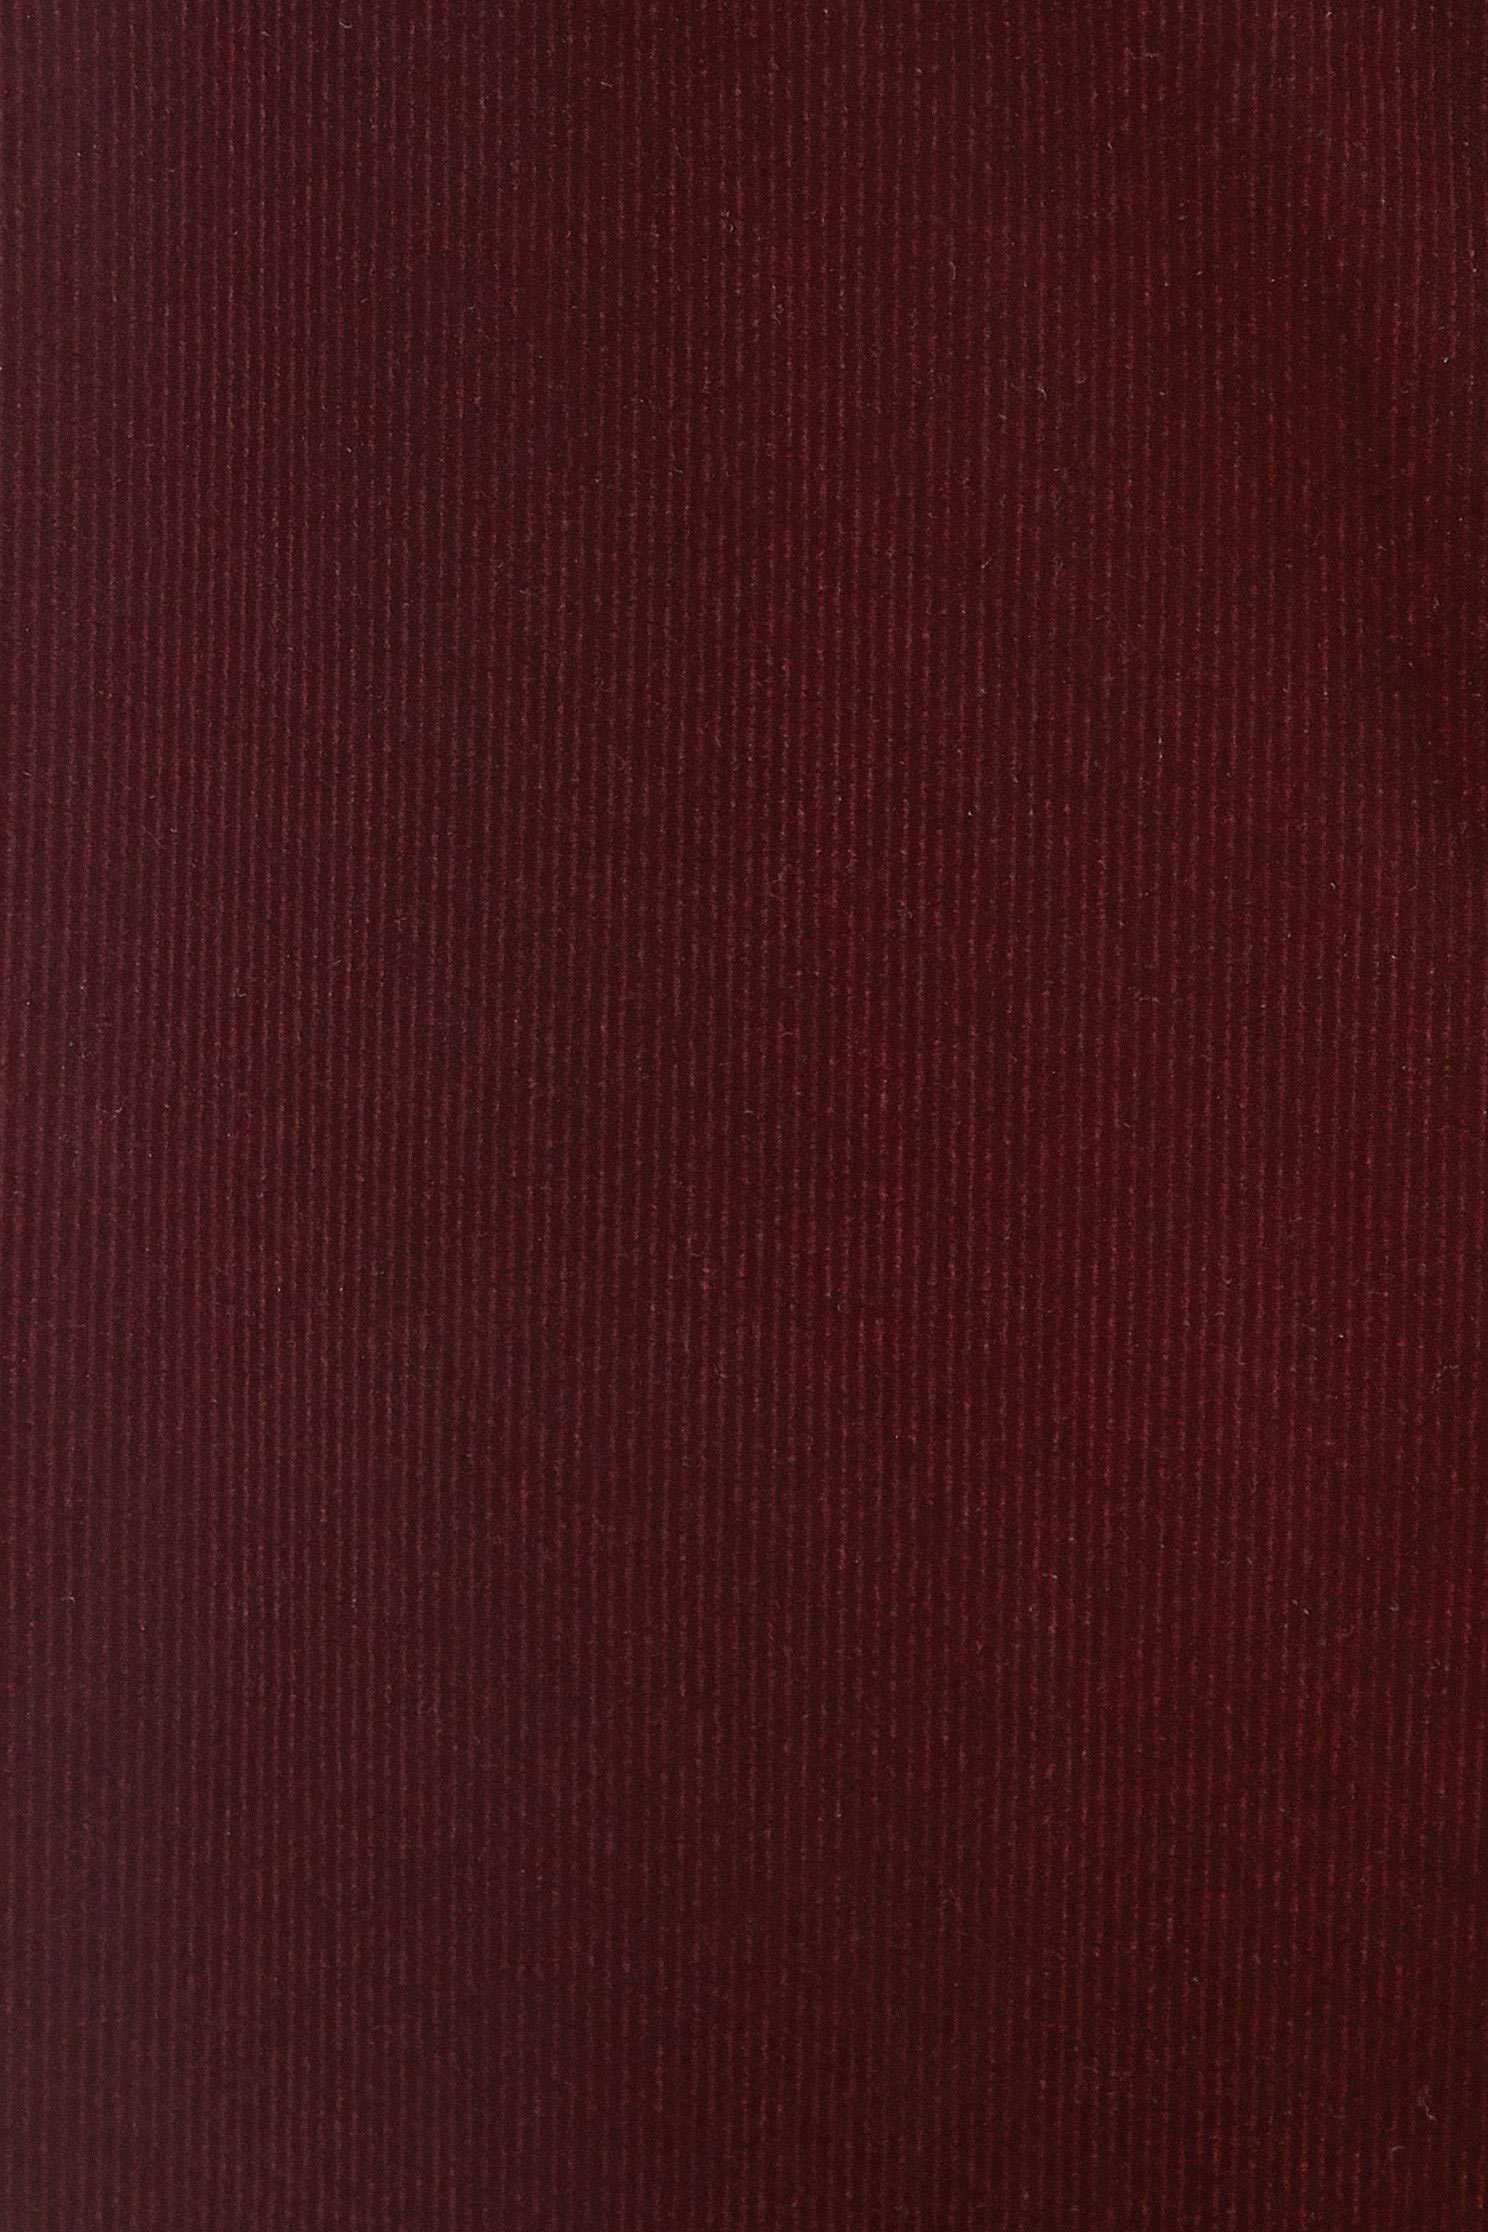 Wide tube trousers,Culottes Pants,Fantasy purple,Pants,長褲